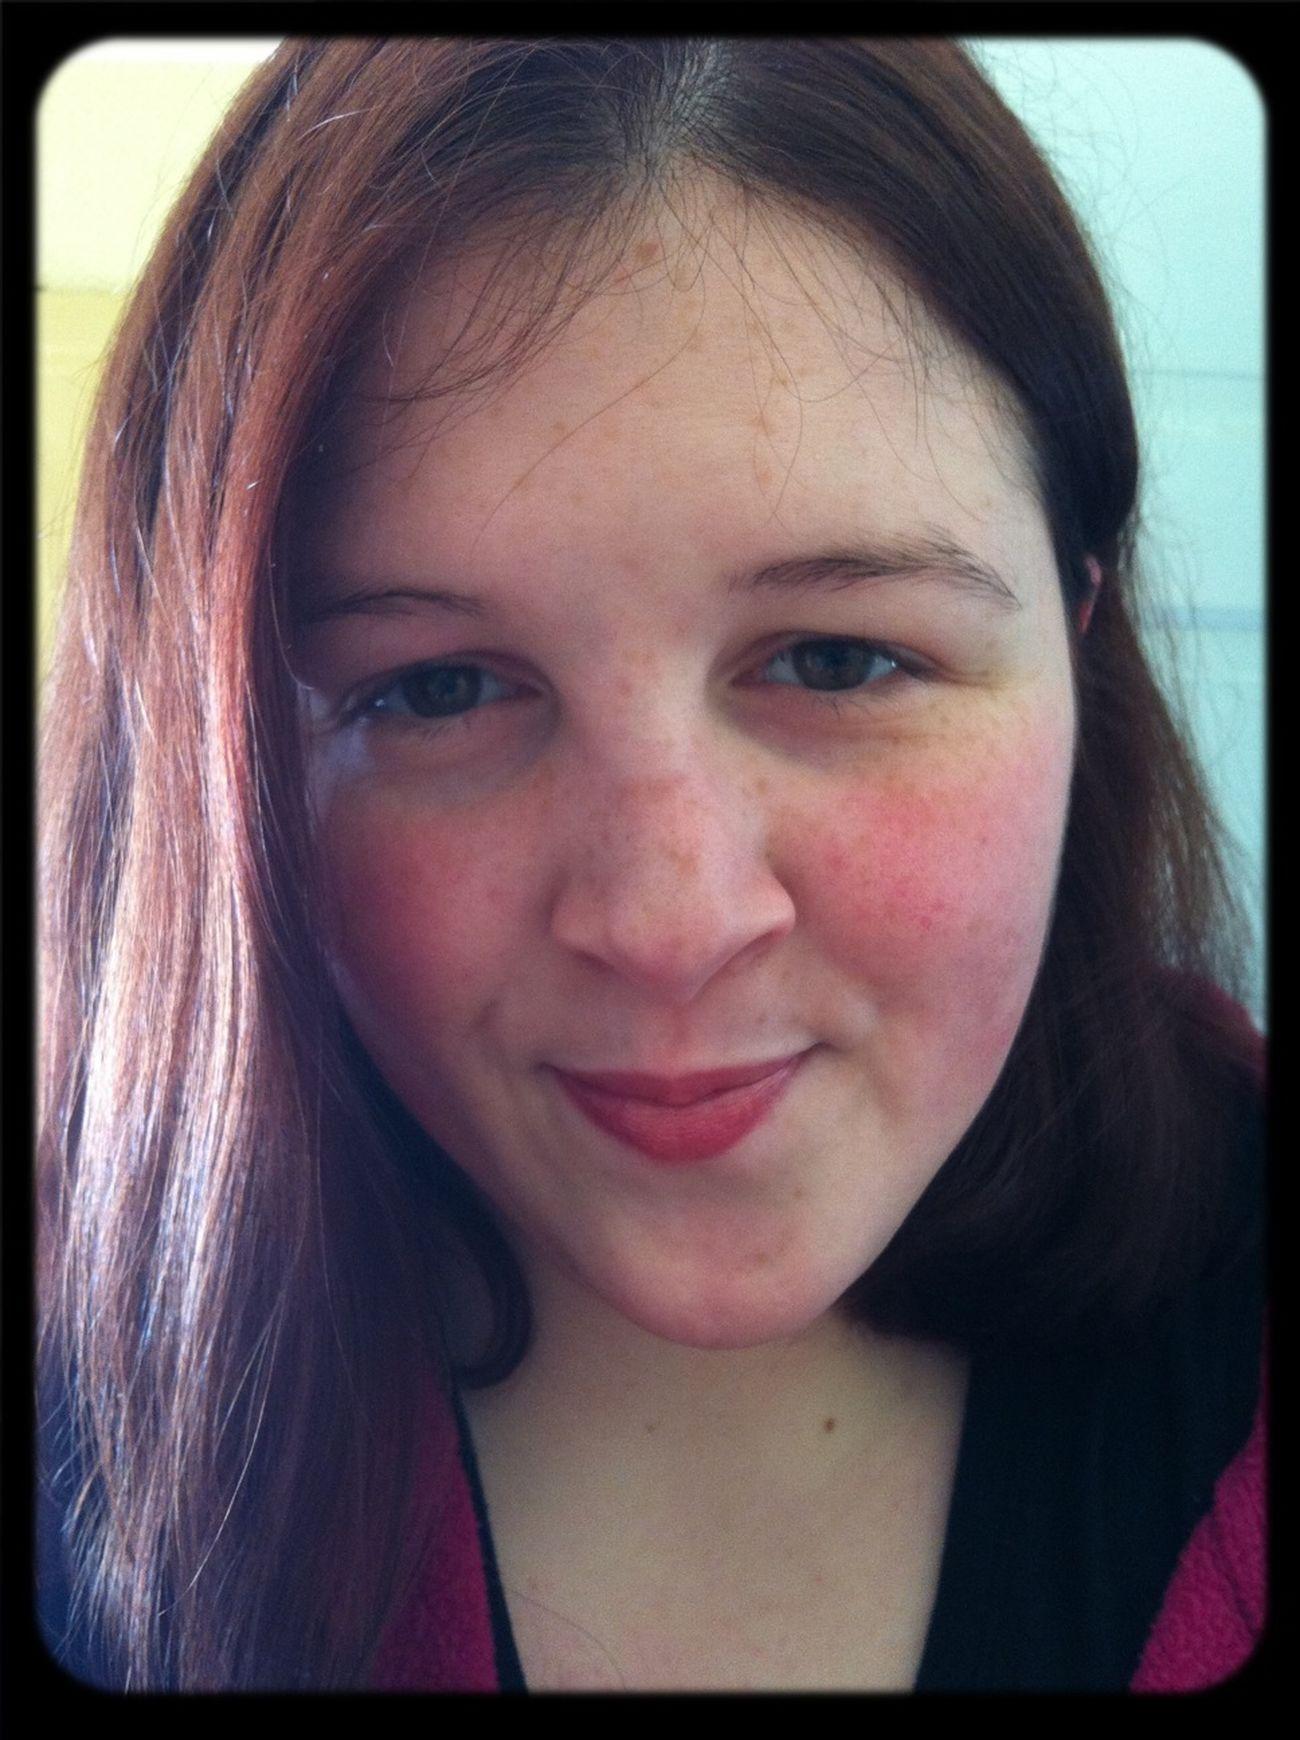 Smile! #nofilter Selfies Galore